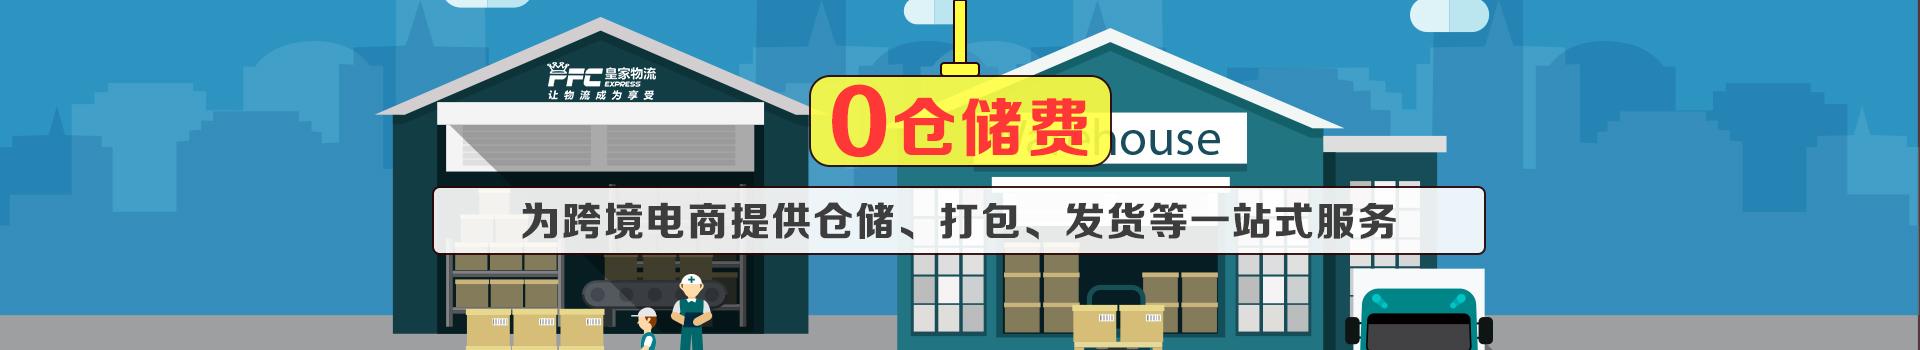 PFC深圳电商仓储